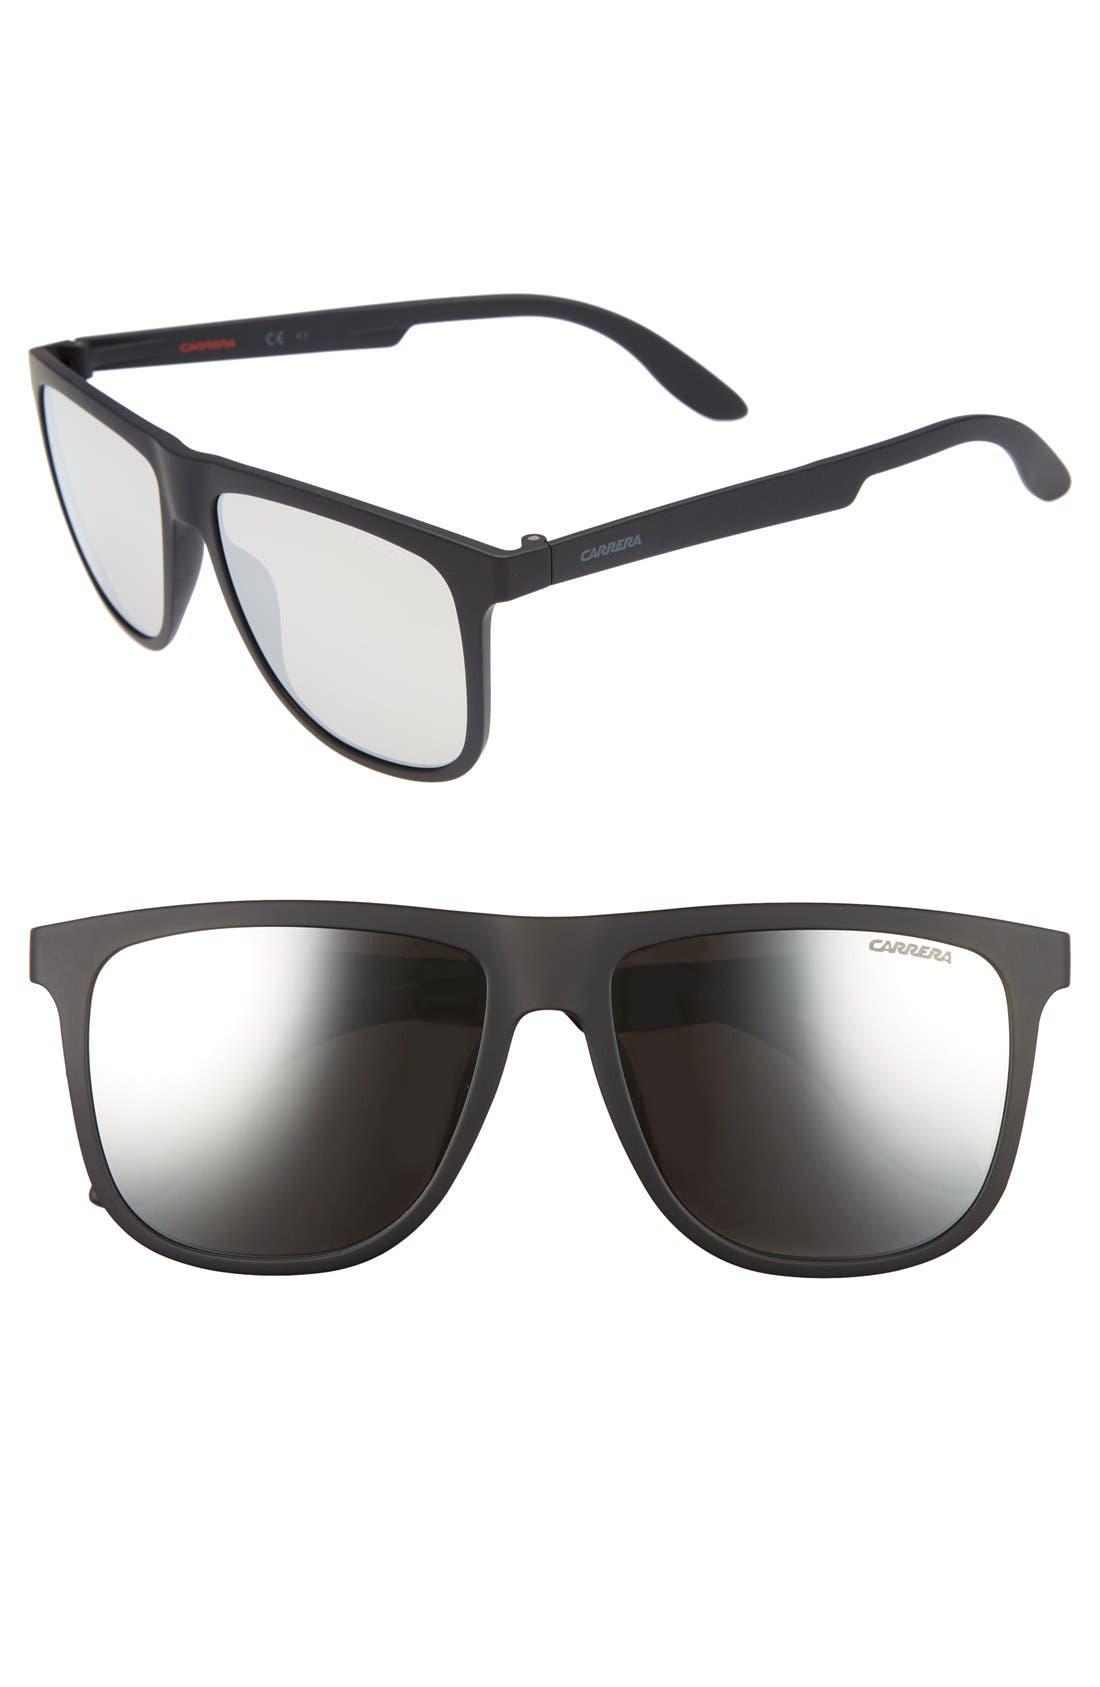 5003ST 57mm Sunglasses,                             Main thumbnail 1, color,                             001